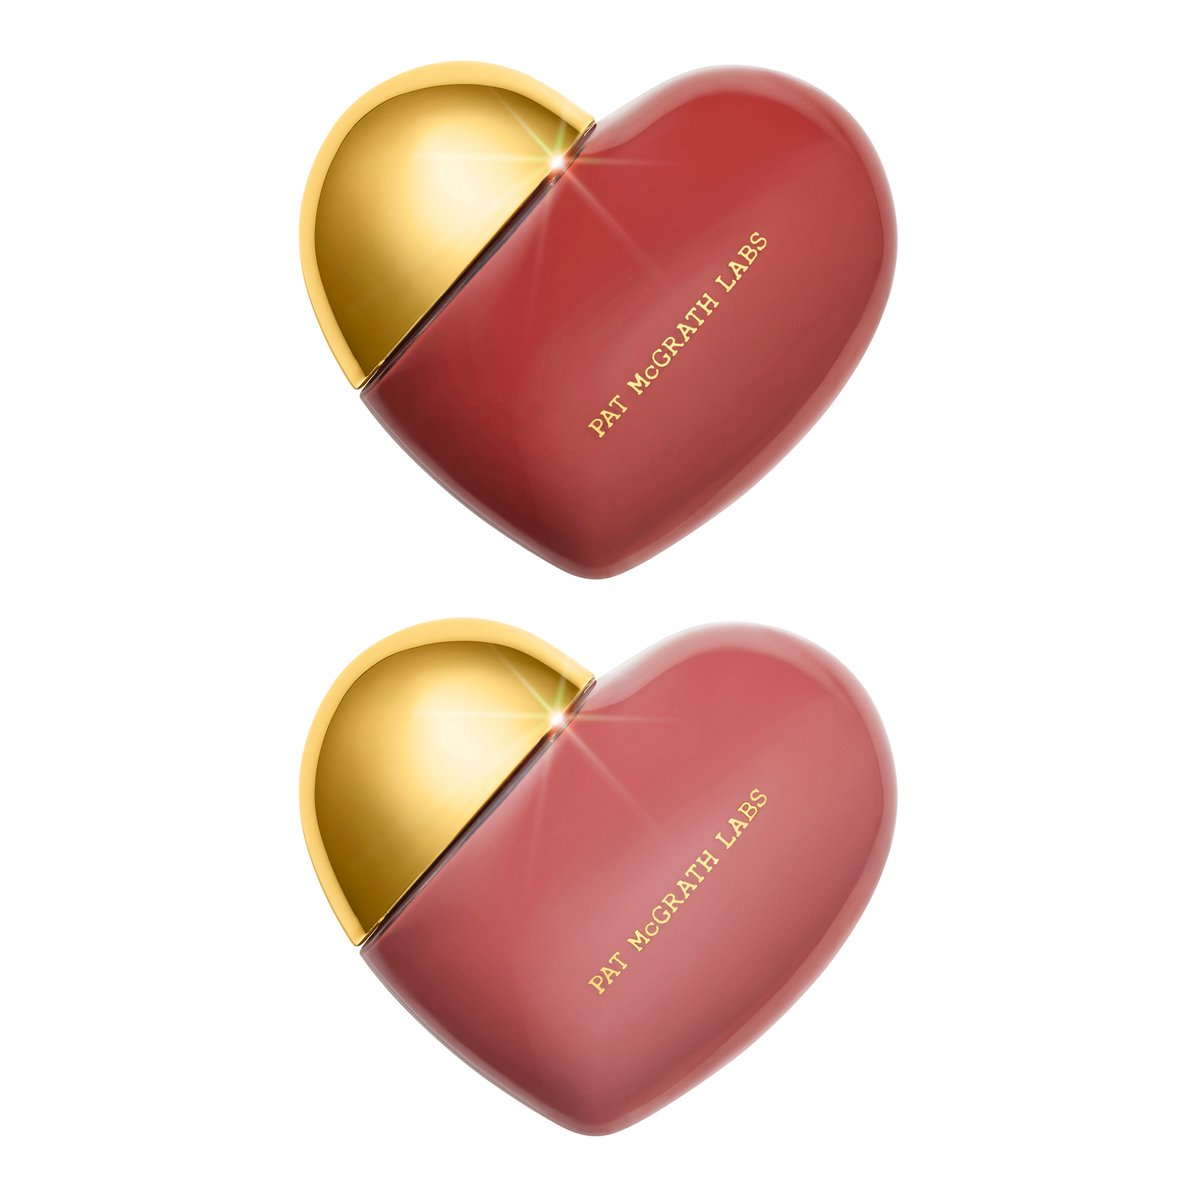 Duo Gloss: Love & Lust - Pat McGrath